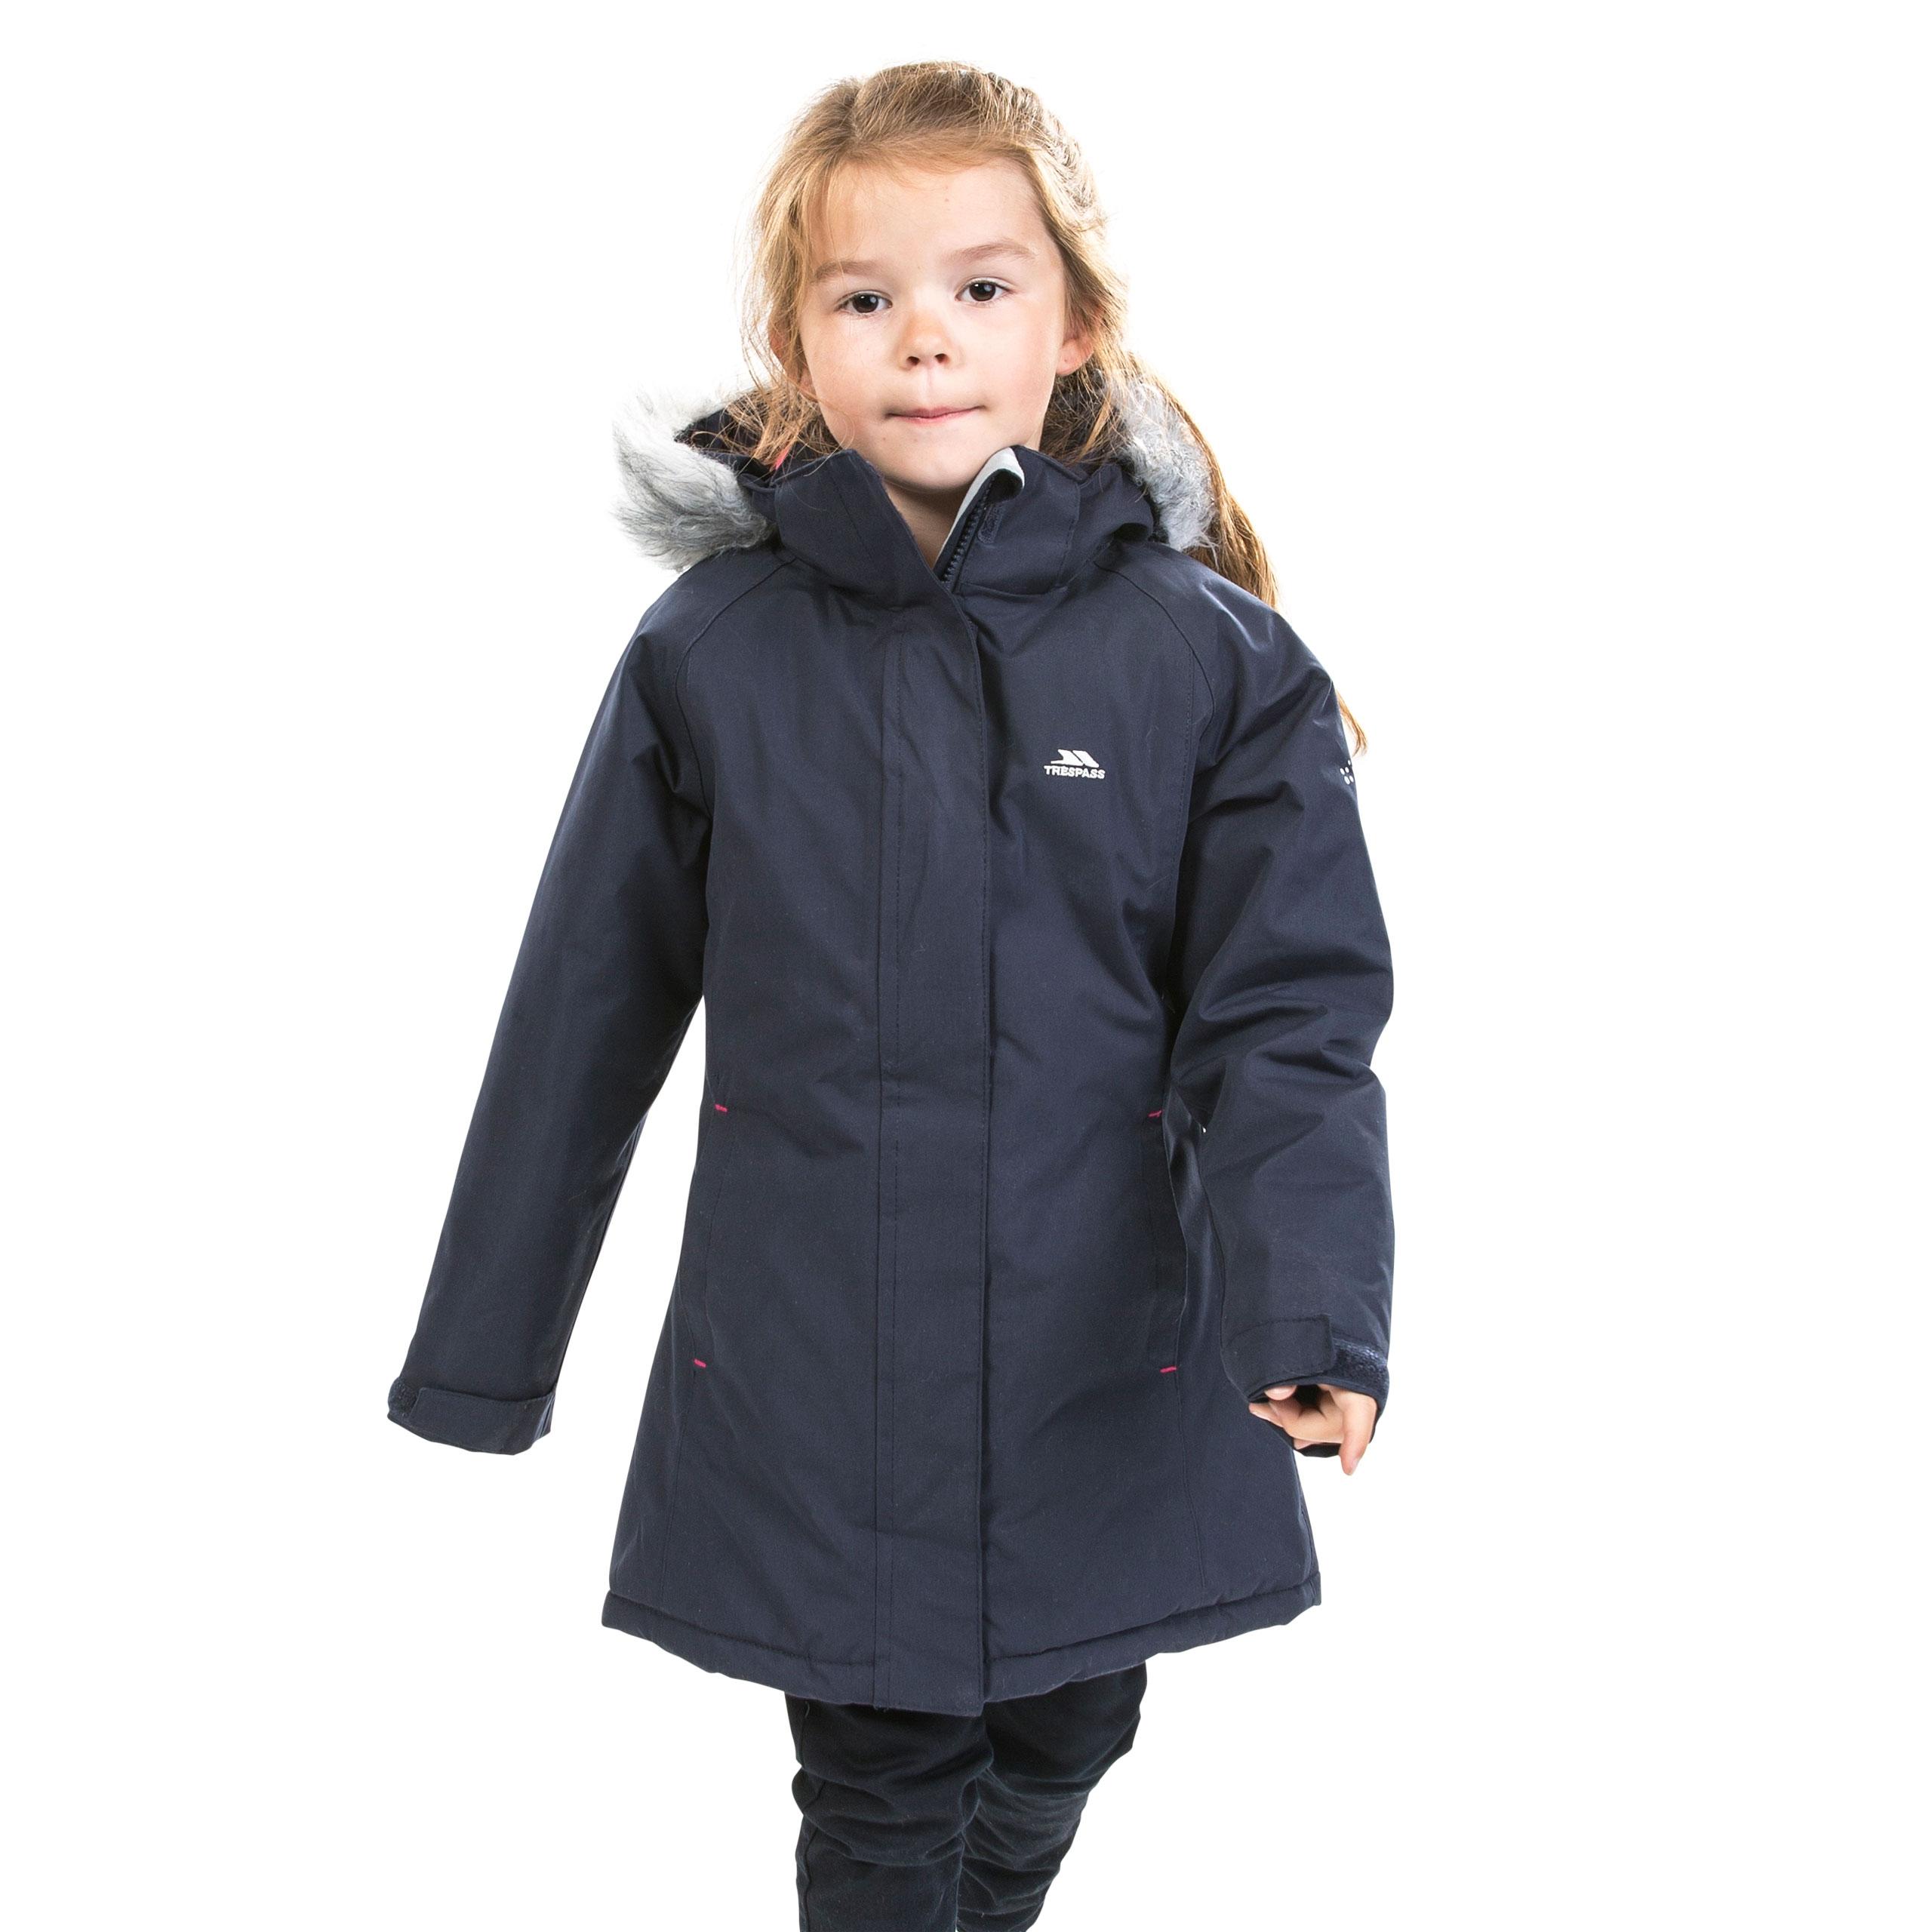 1f4211f09 Fame Girls Waterproof Jacket | Trespass UK